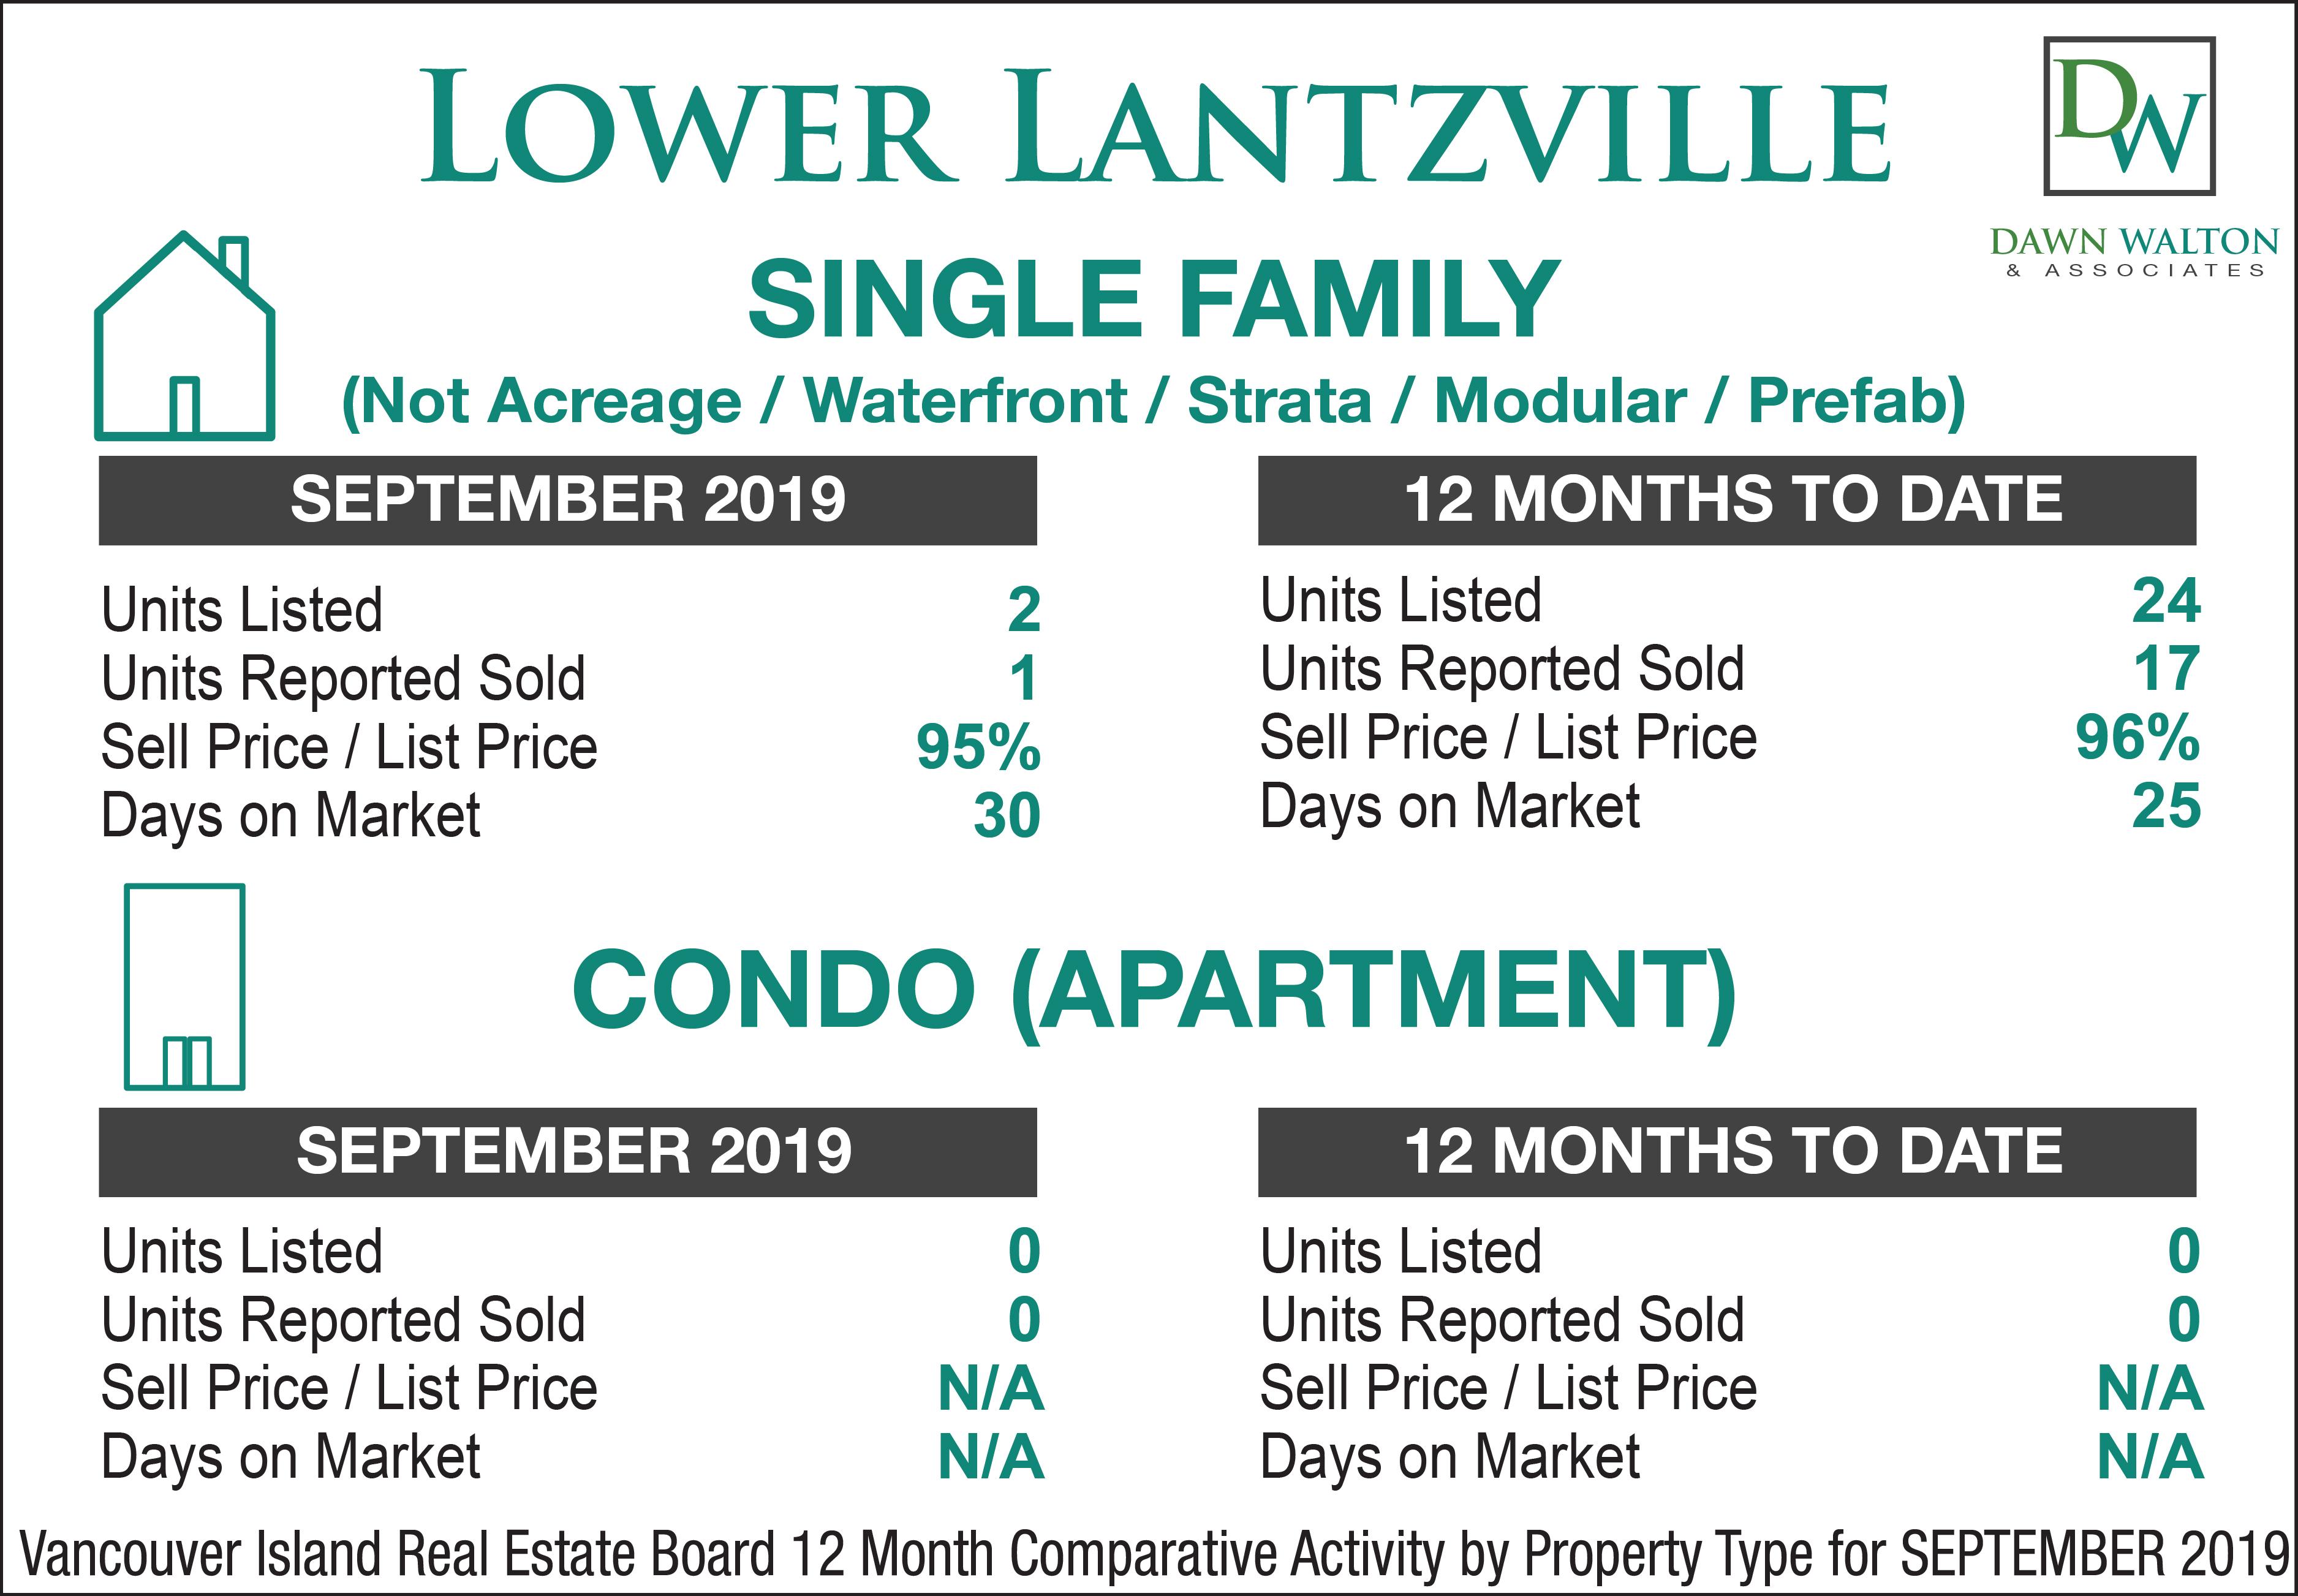 Lower Lantzville Real Estate Market Stats September 2019 - Nanaimo Realtor Dawn Walton